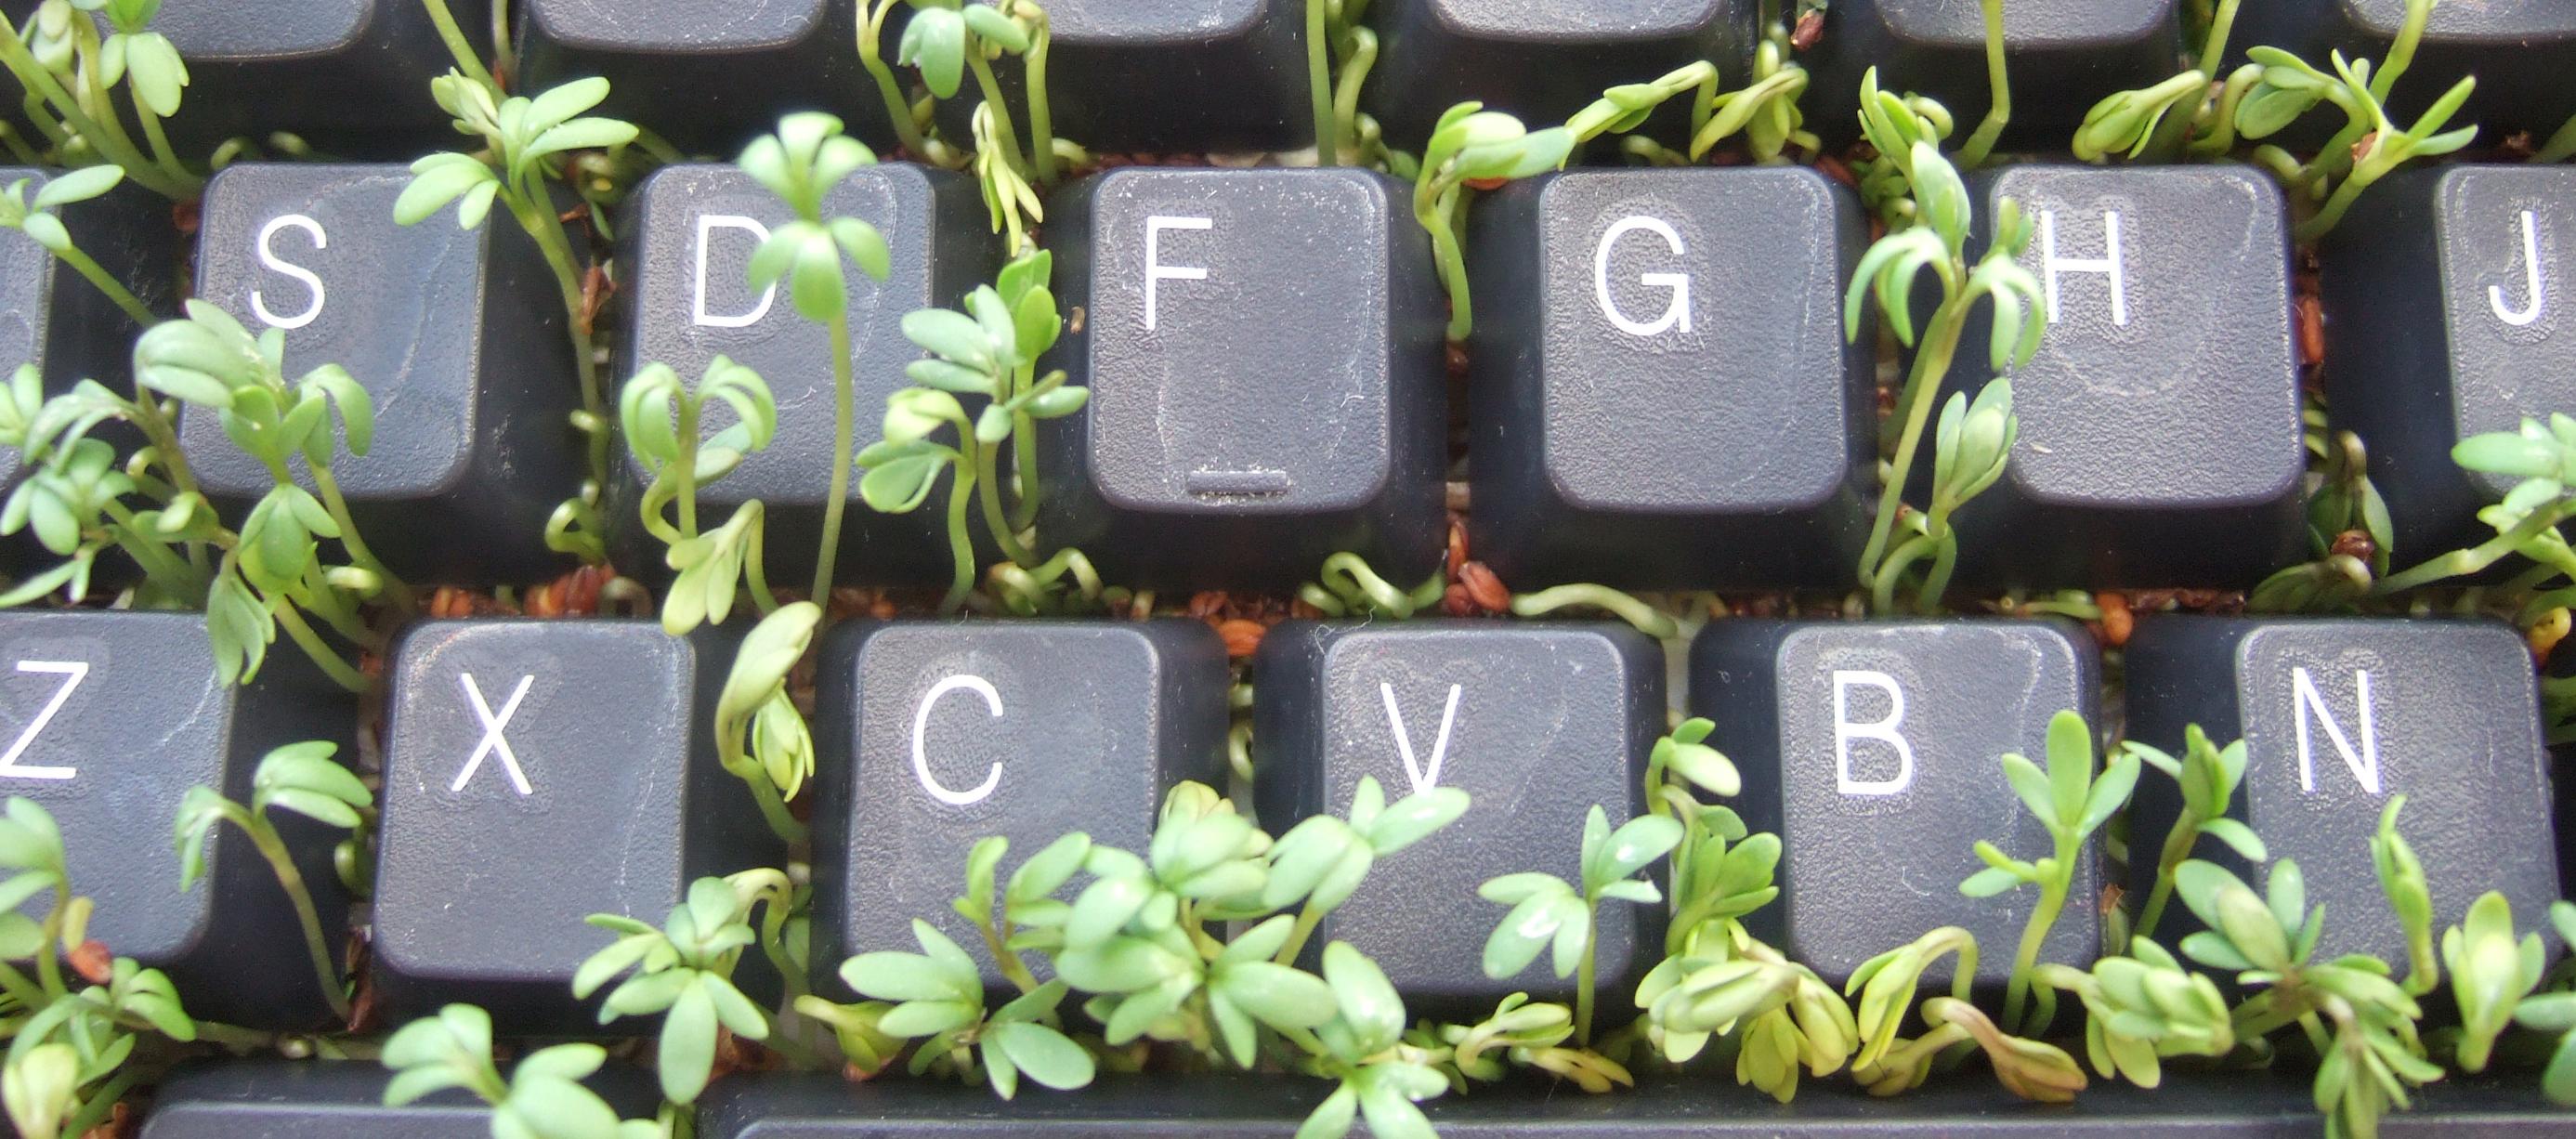 tumblr the office. Office Tumblr. The Poop Tumblr